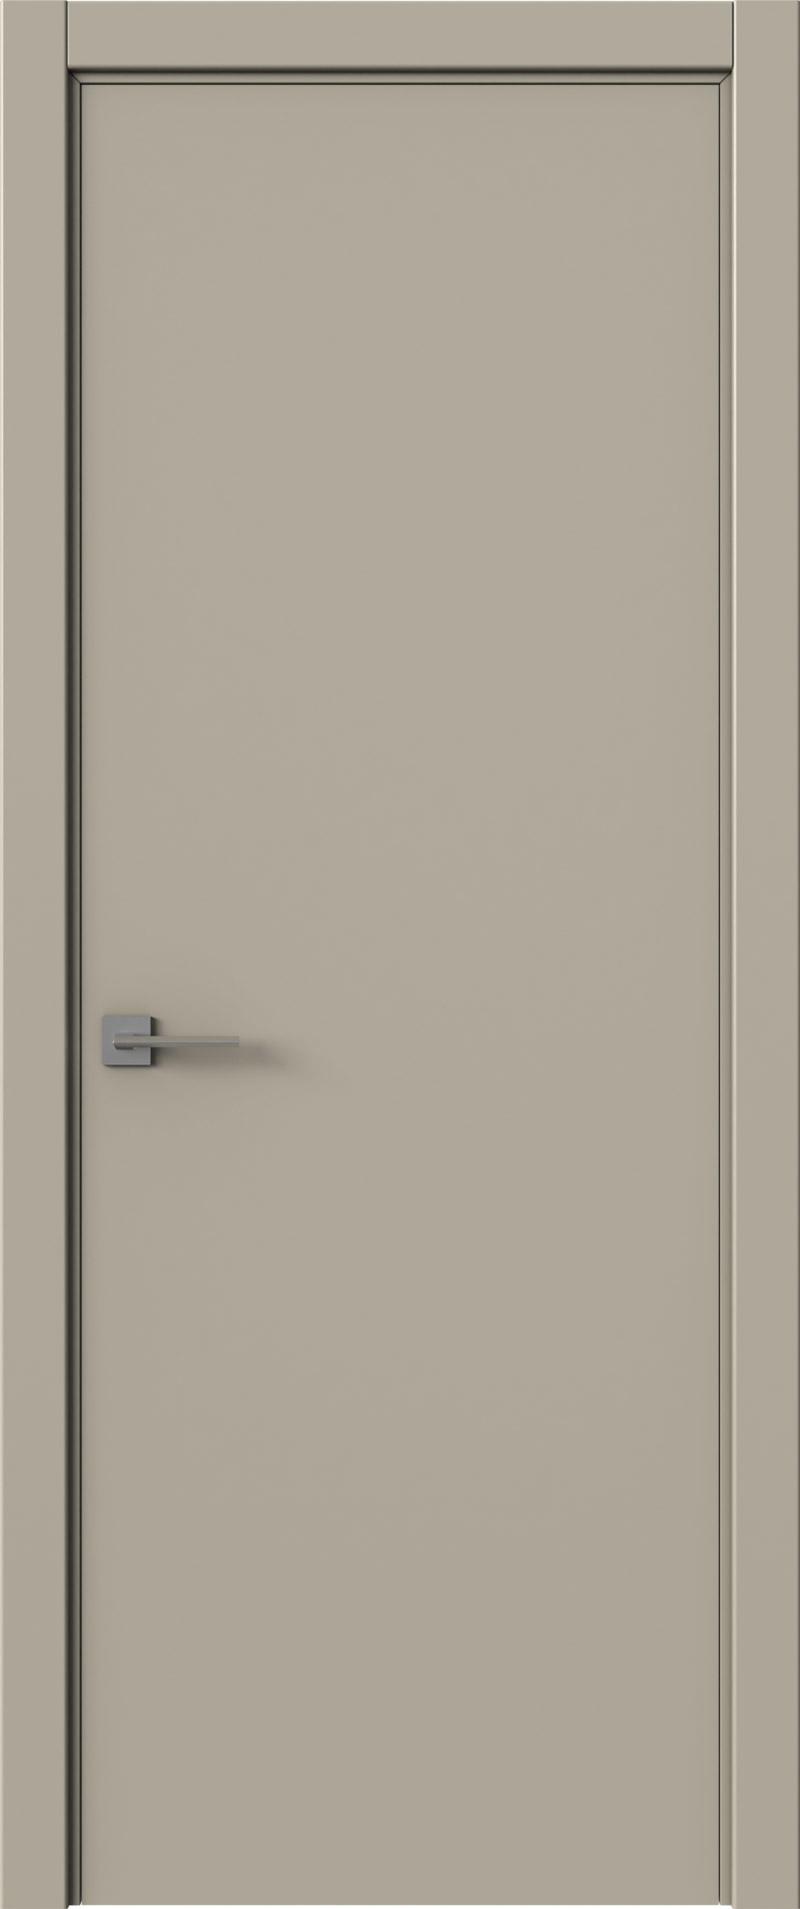 Tivoli А-5 цвет - Серо-оливковая эмаль (RAL 7032) Без стекла (ДГ)